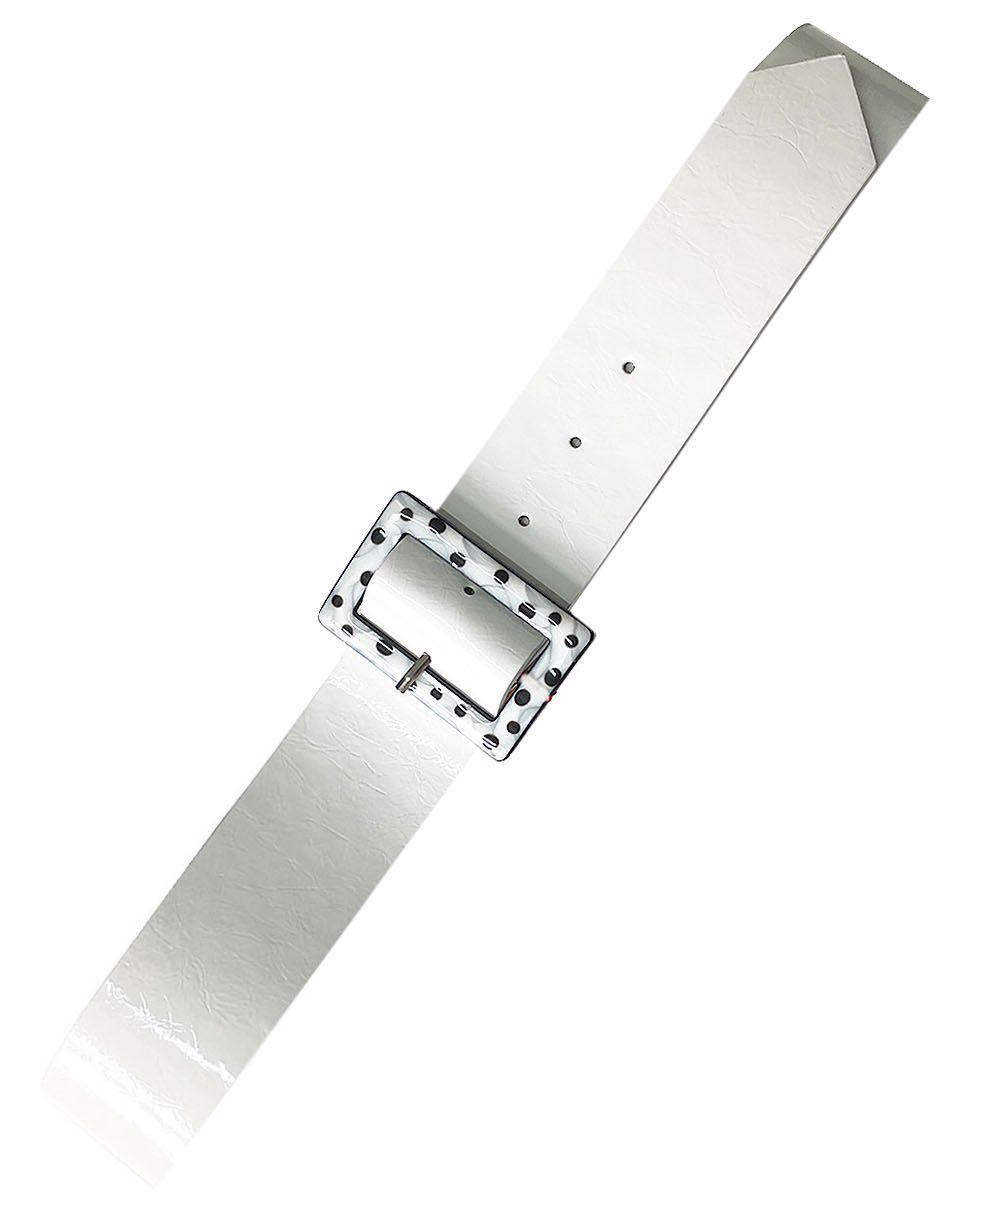 BNAC45248WHT_ceinture-retro-pin-up-rockabilly-50-s-chenelle